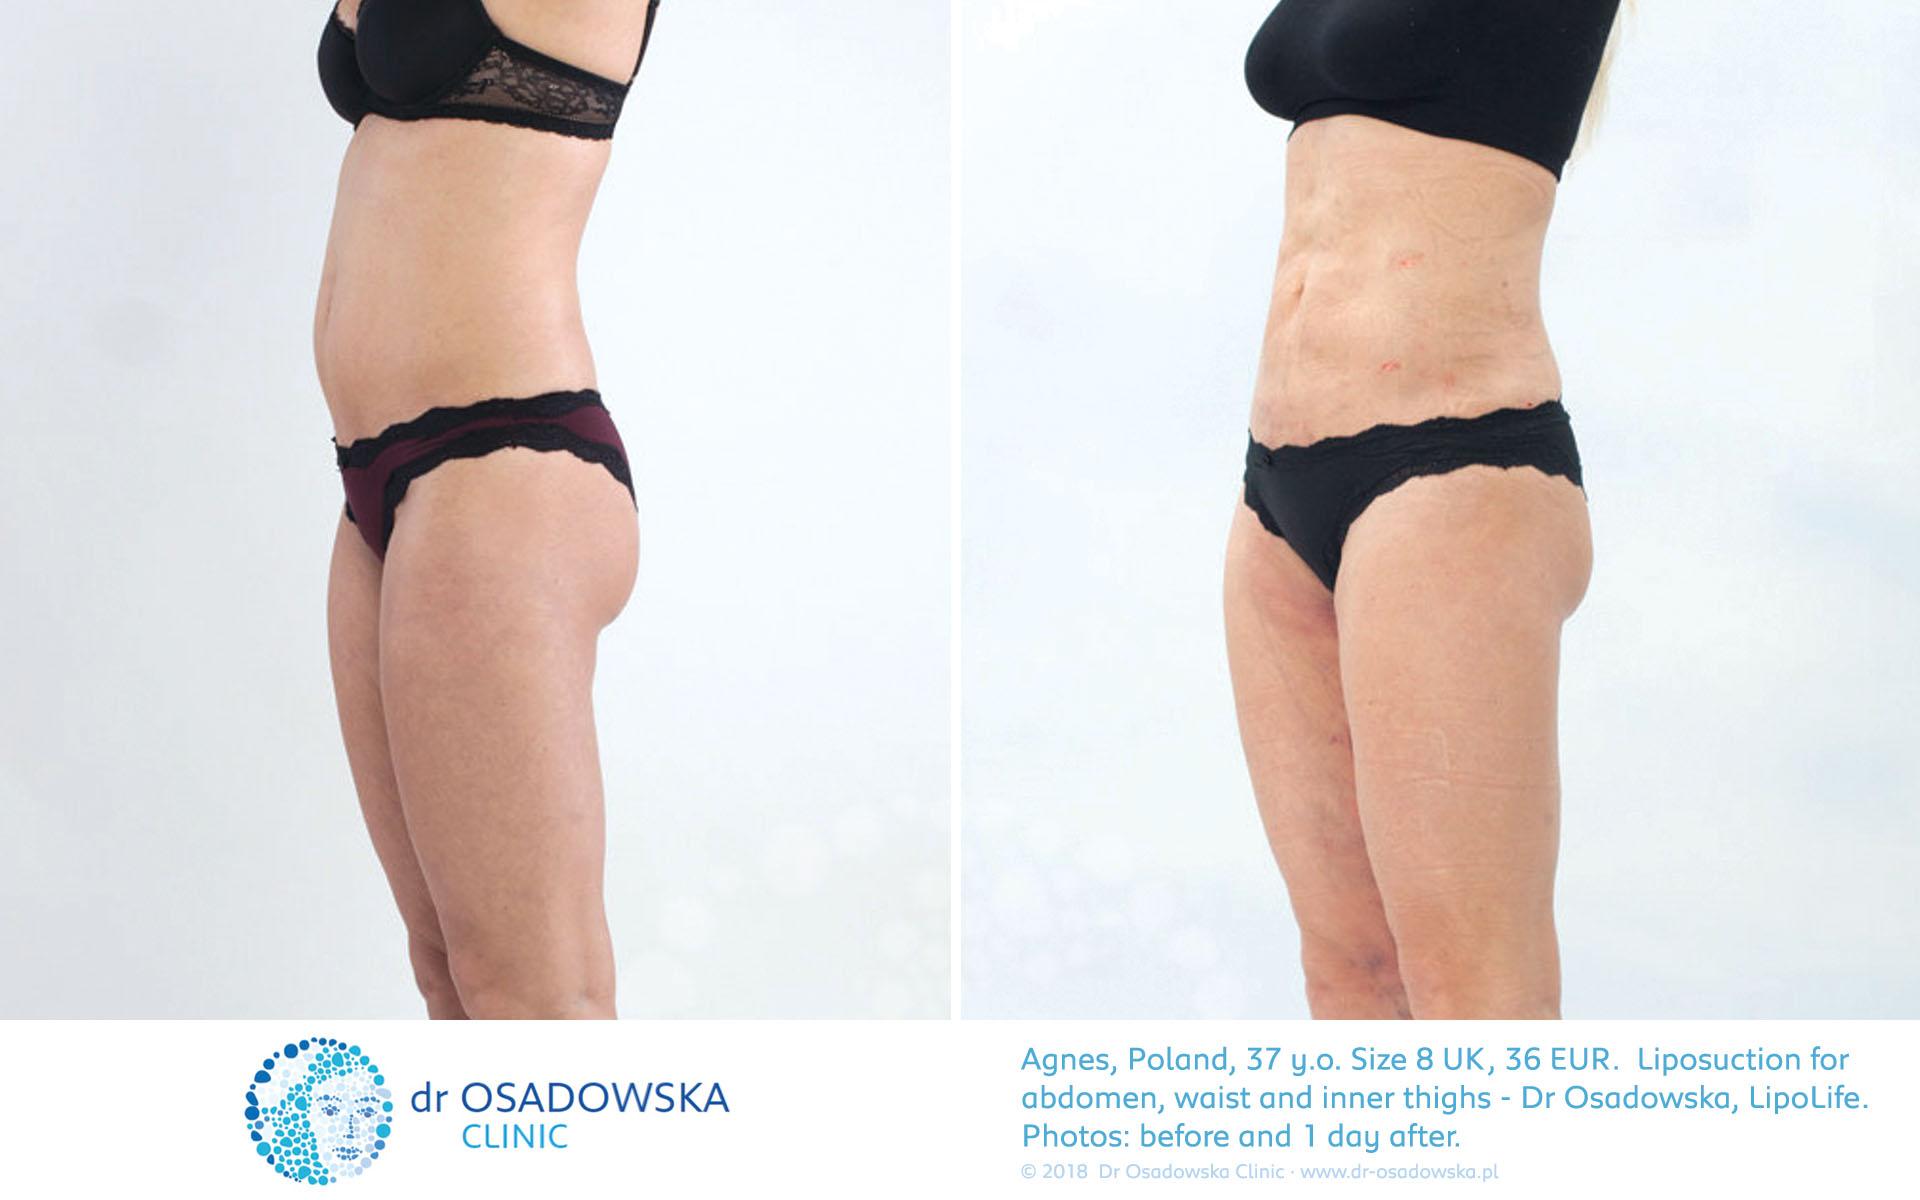 Real Photos Liposuction Of Abdomen And Love Handles Agnes 1 Day After Dr Osadowska Clinic Poland